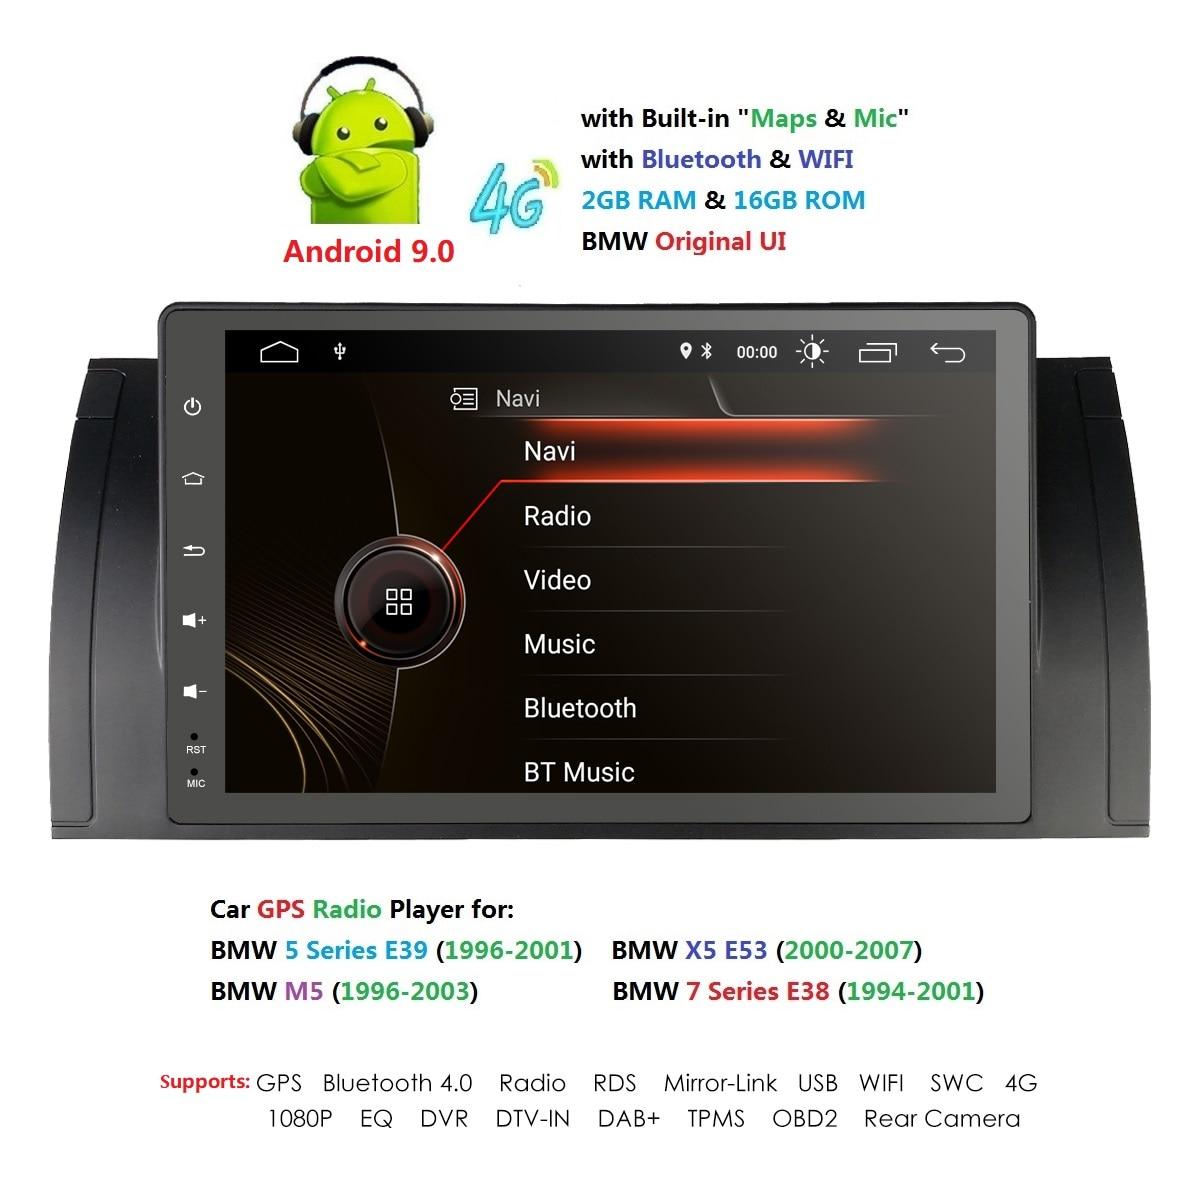 Ossuret DSP IPS Android 9.0 2 DIN voiture DVD GPS pour Audi TT MK2 8J 2006 2007 2008 2009 2010 2011 2012 lecteur multimédia radio obd2